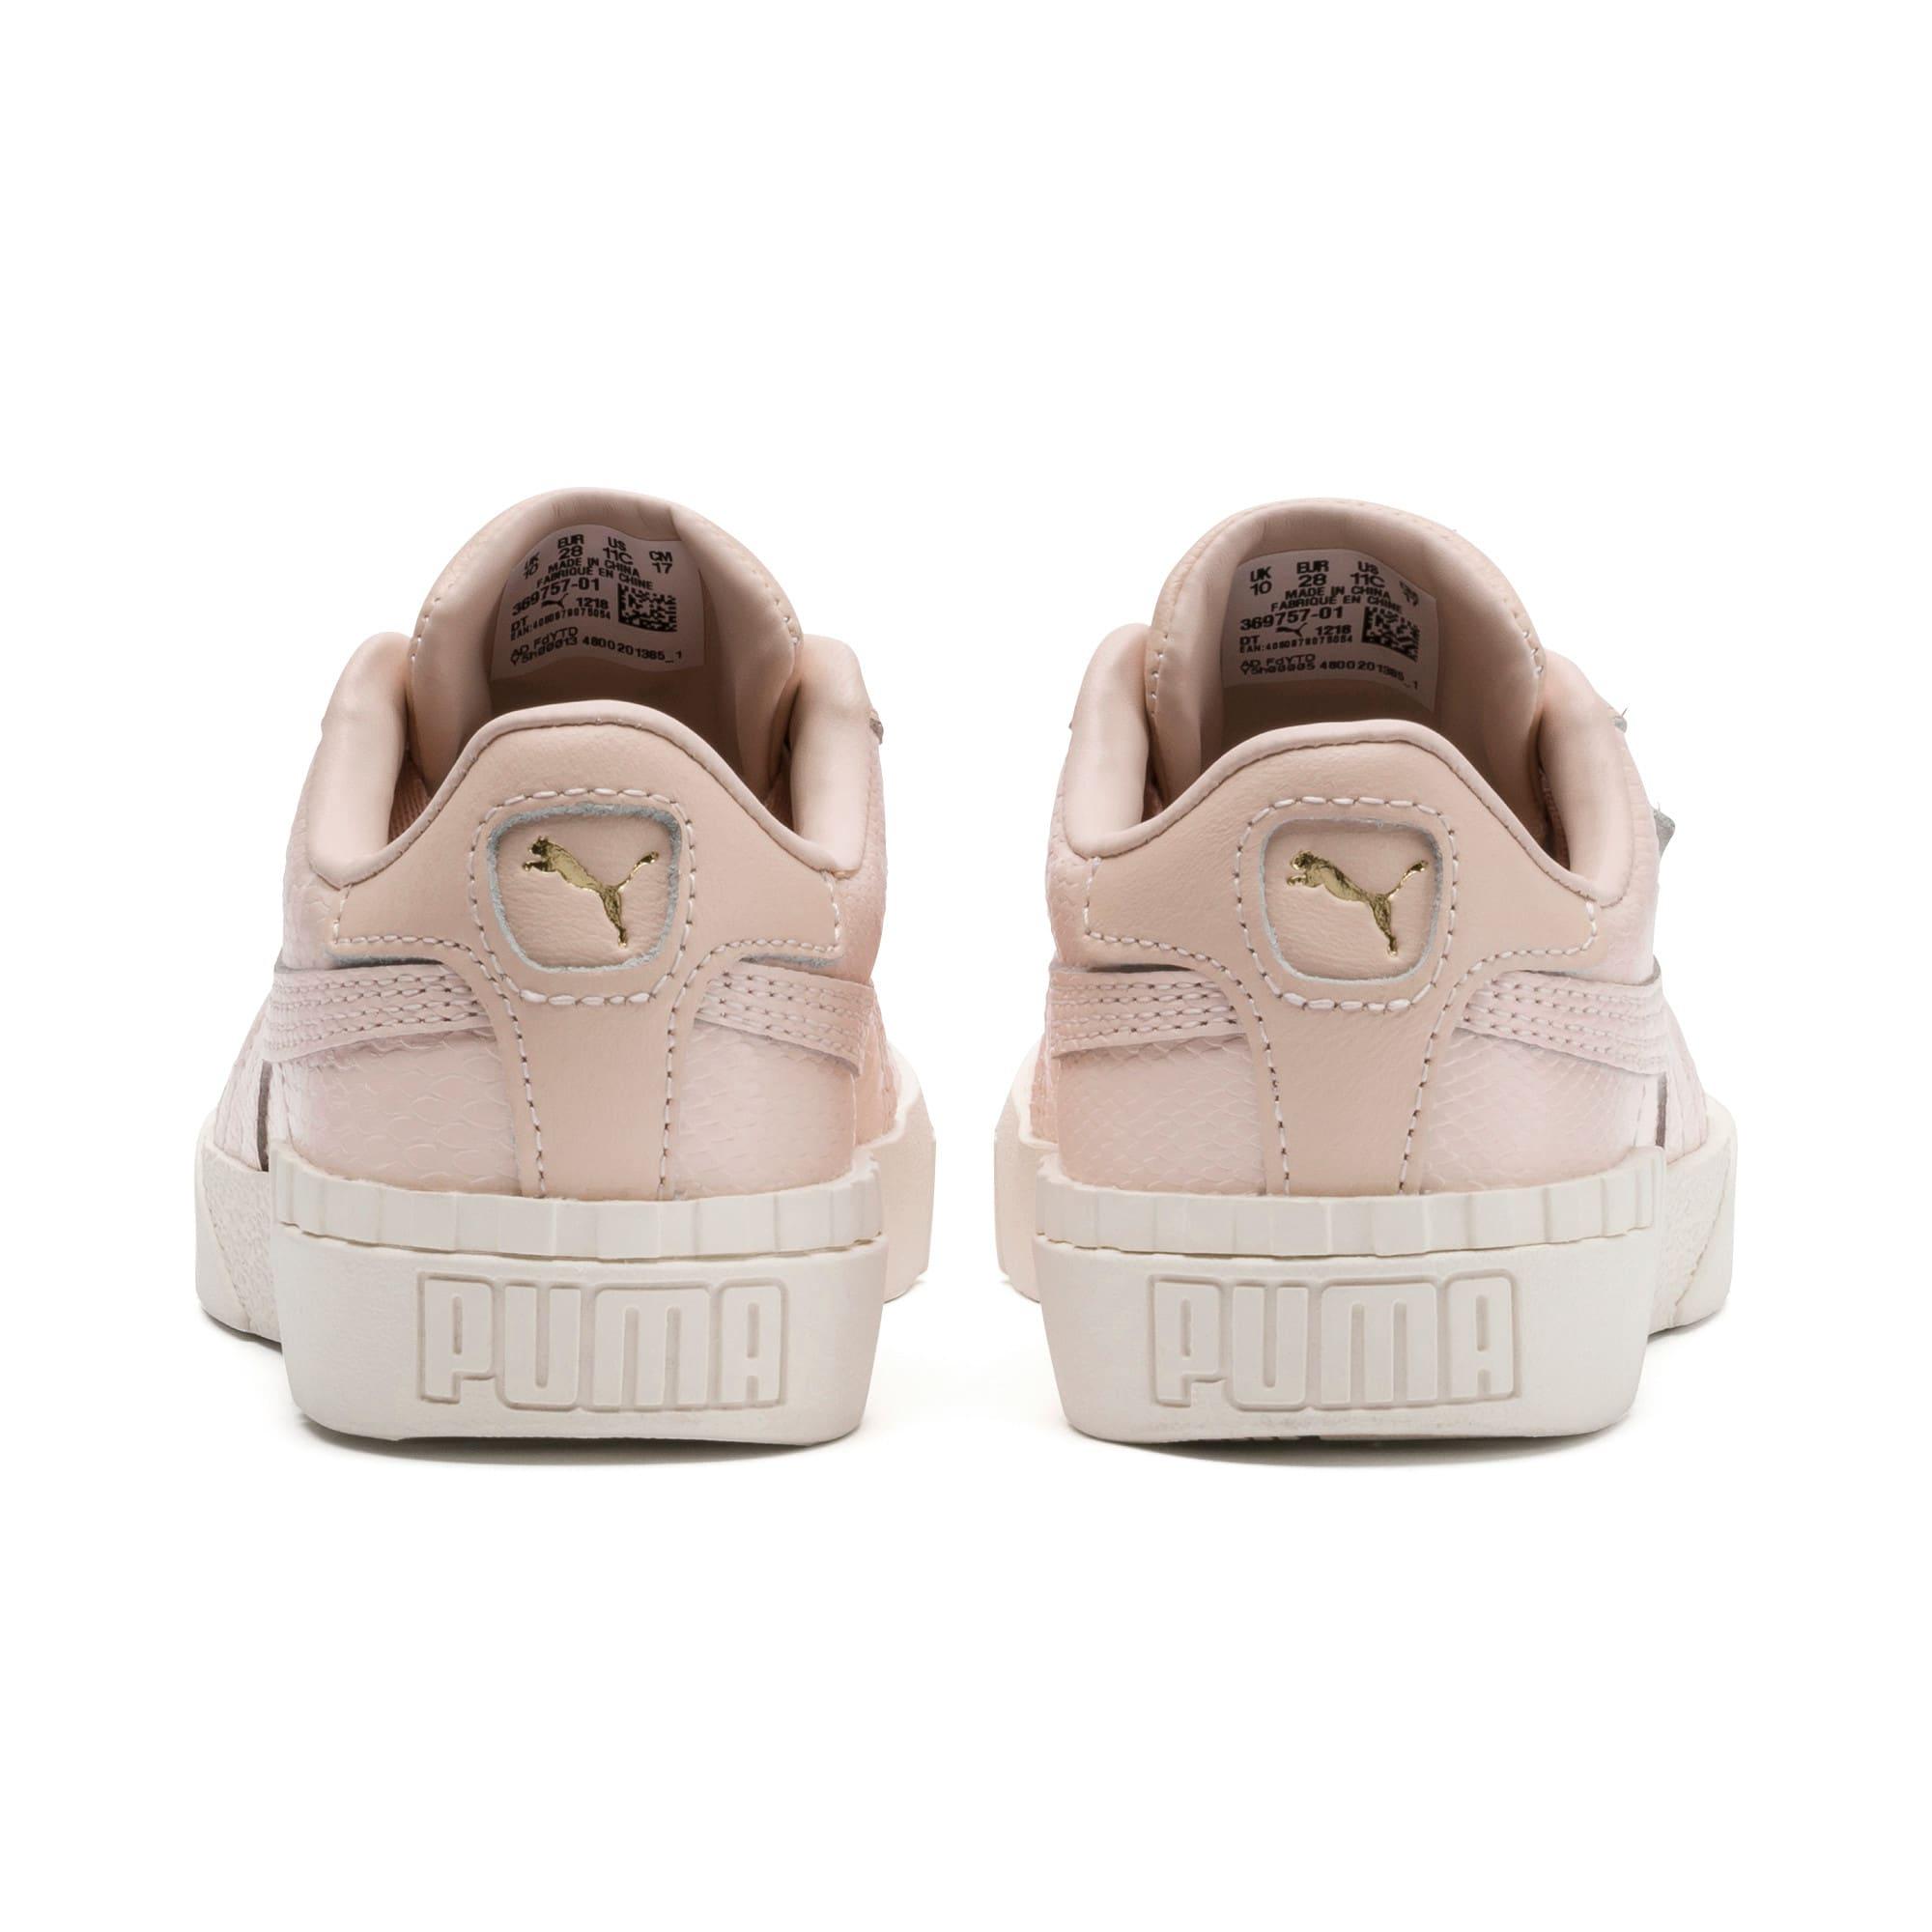 Imagen en miniatura 3 de Zapatillas de niña Cali Emboss Kid, Cream Tan-Cream Tan, mediana